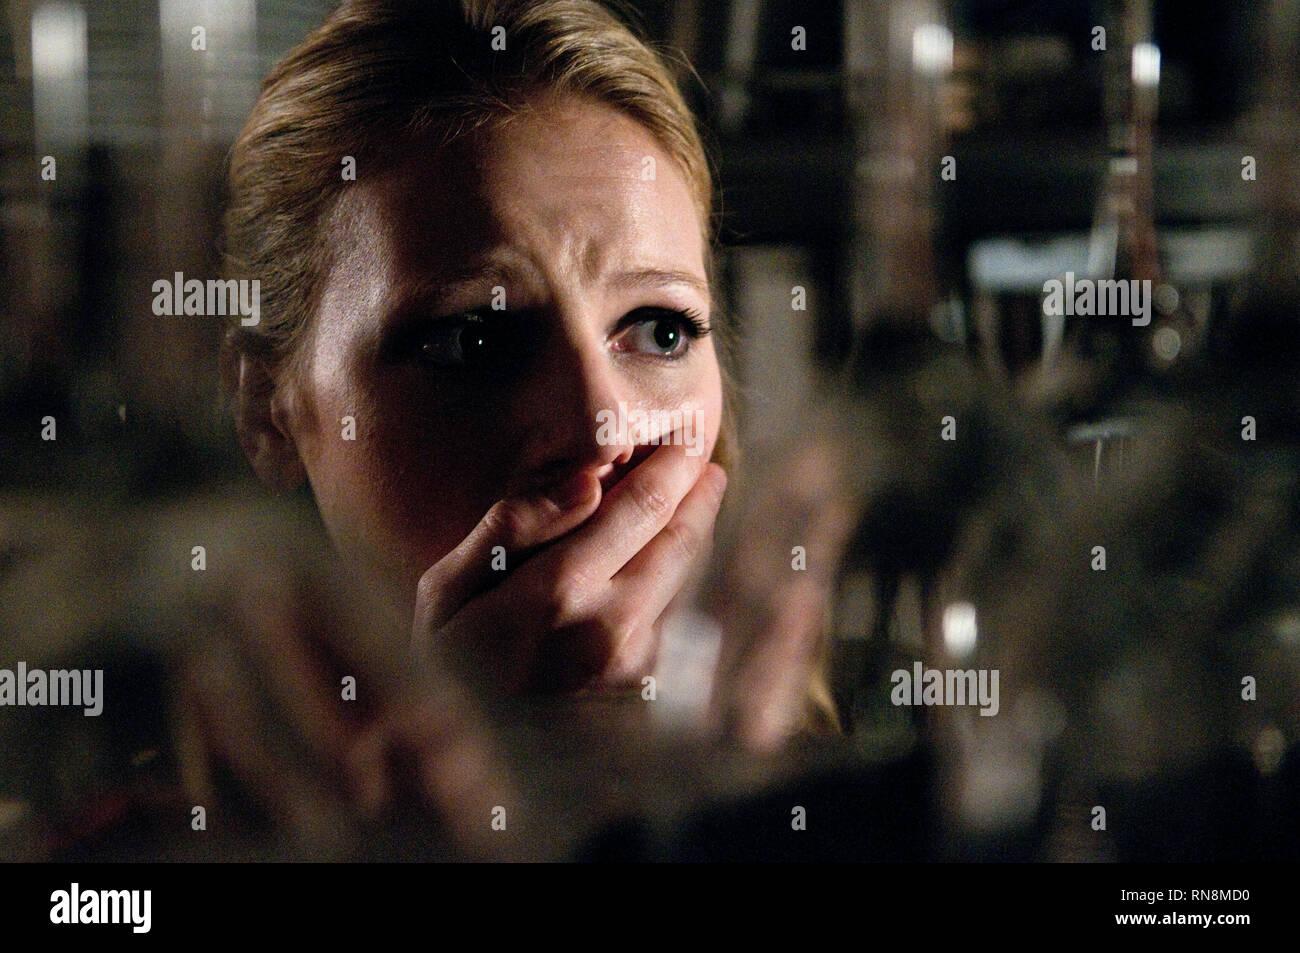 EMMA BELL, FINAL DESTINATION 5, 2011 - Stock Image